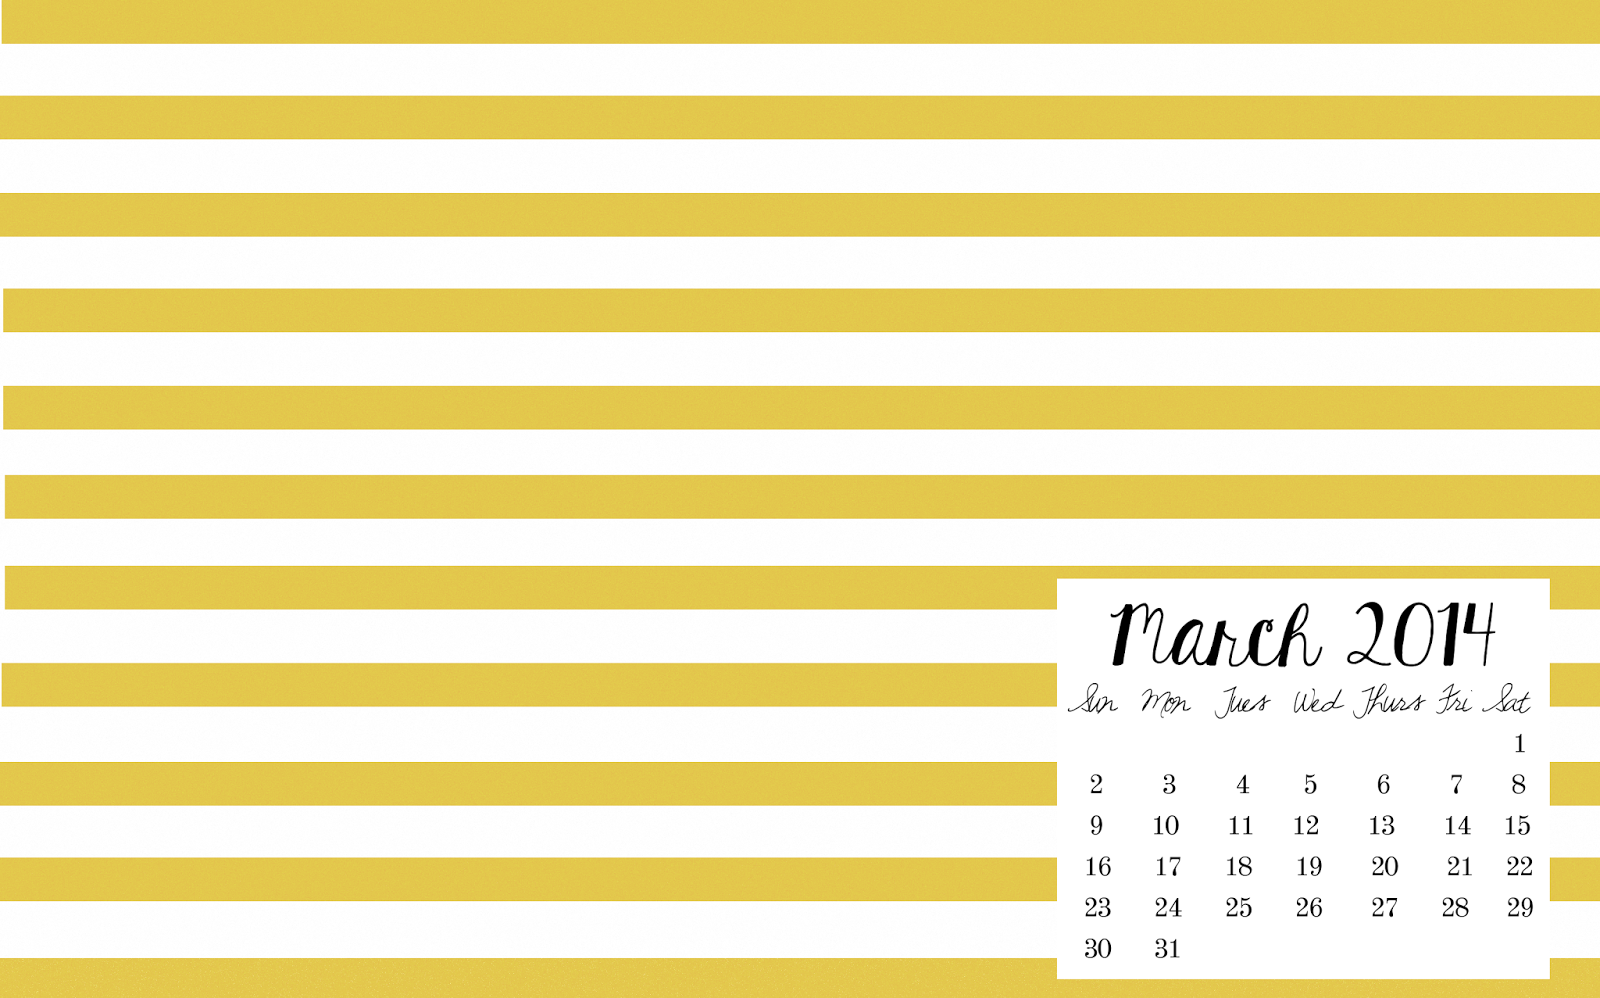 March April May 2014 Calendar My march 2014 desktop